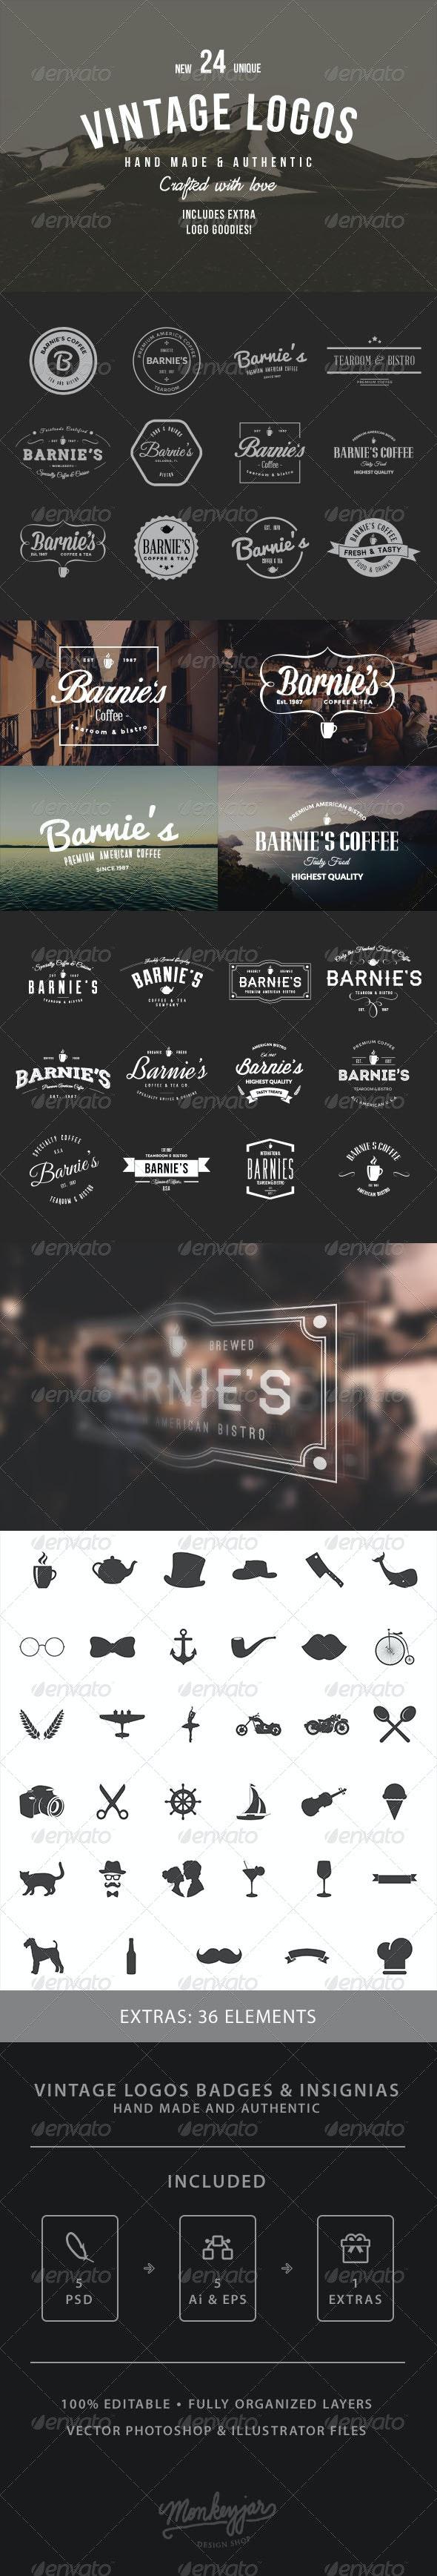 24 Old-School Logos & Badges - Badges & Stickers Web Elements